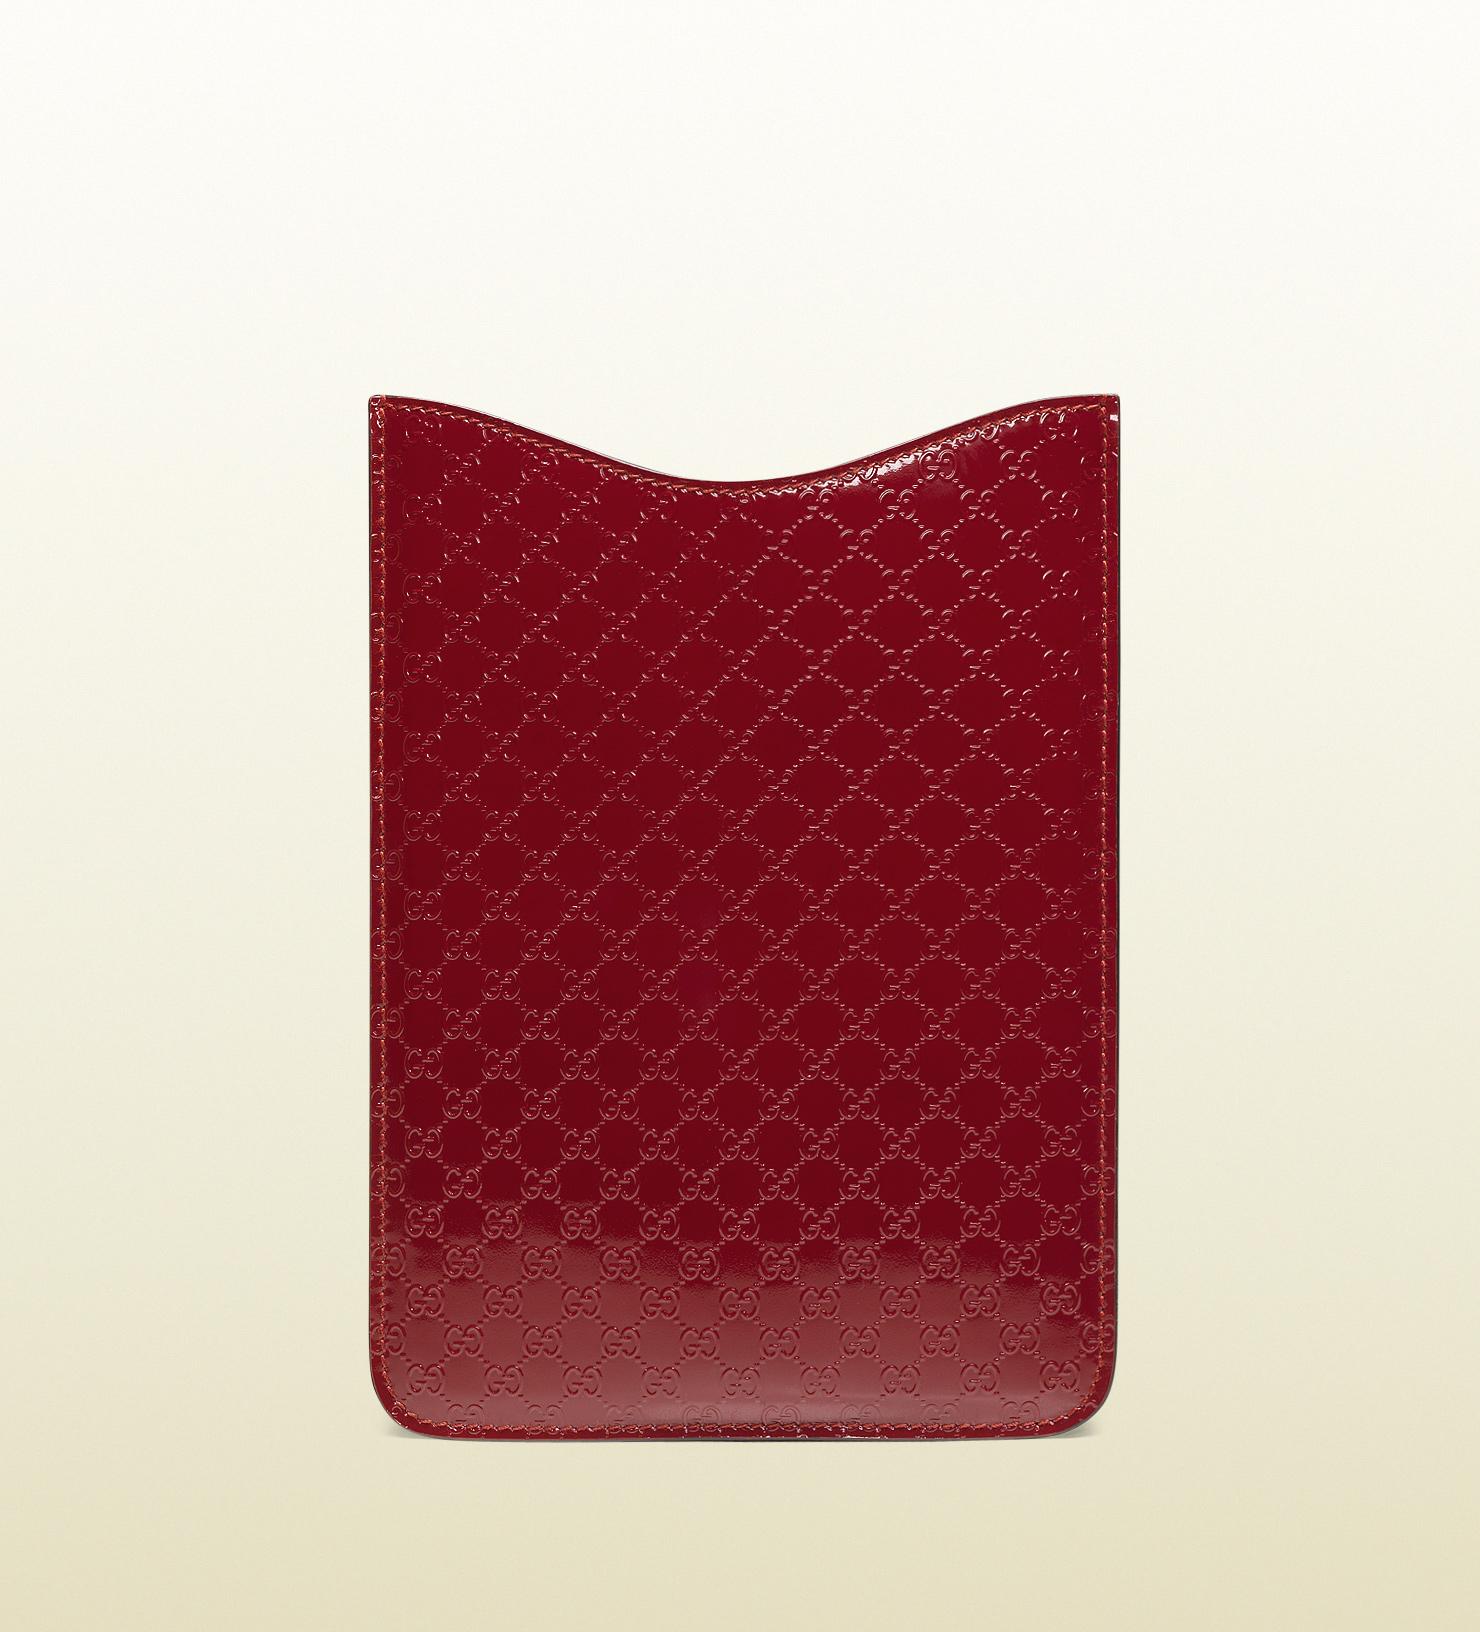 0a3a3801614 Lyst - Gucci Microssima Patent Leather Ipad Mini Case in Red